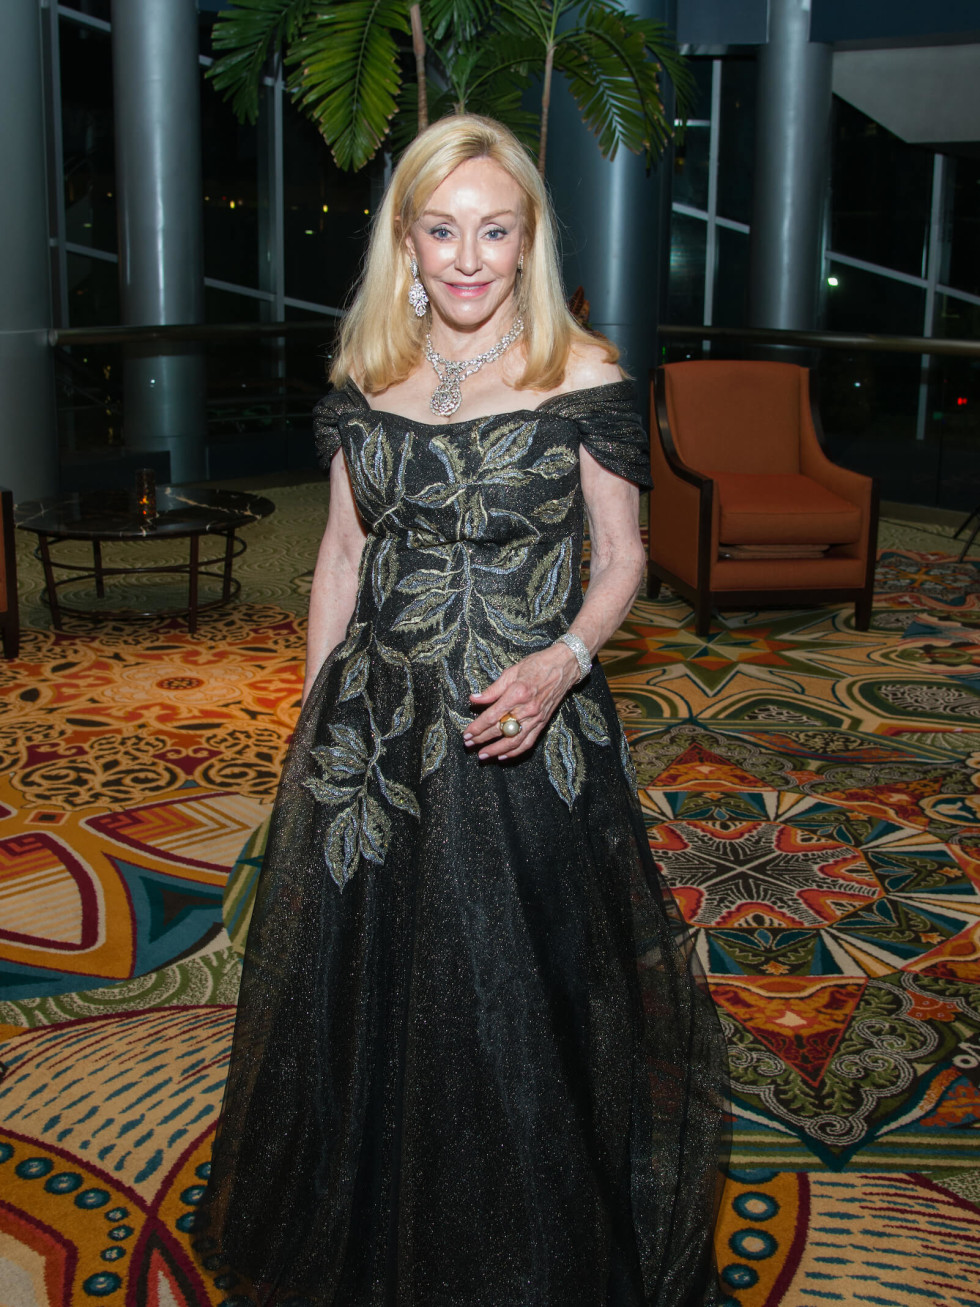 Houston, Women of Distinction fashionable gowns, Feb 2017, Judi McGee